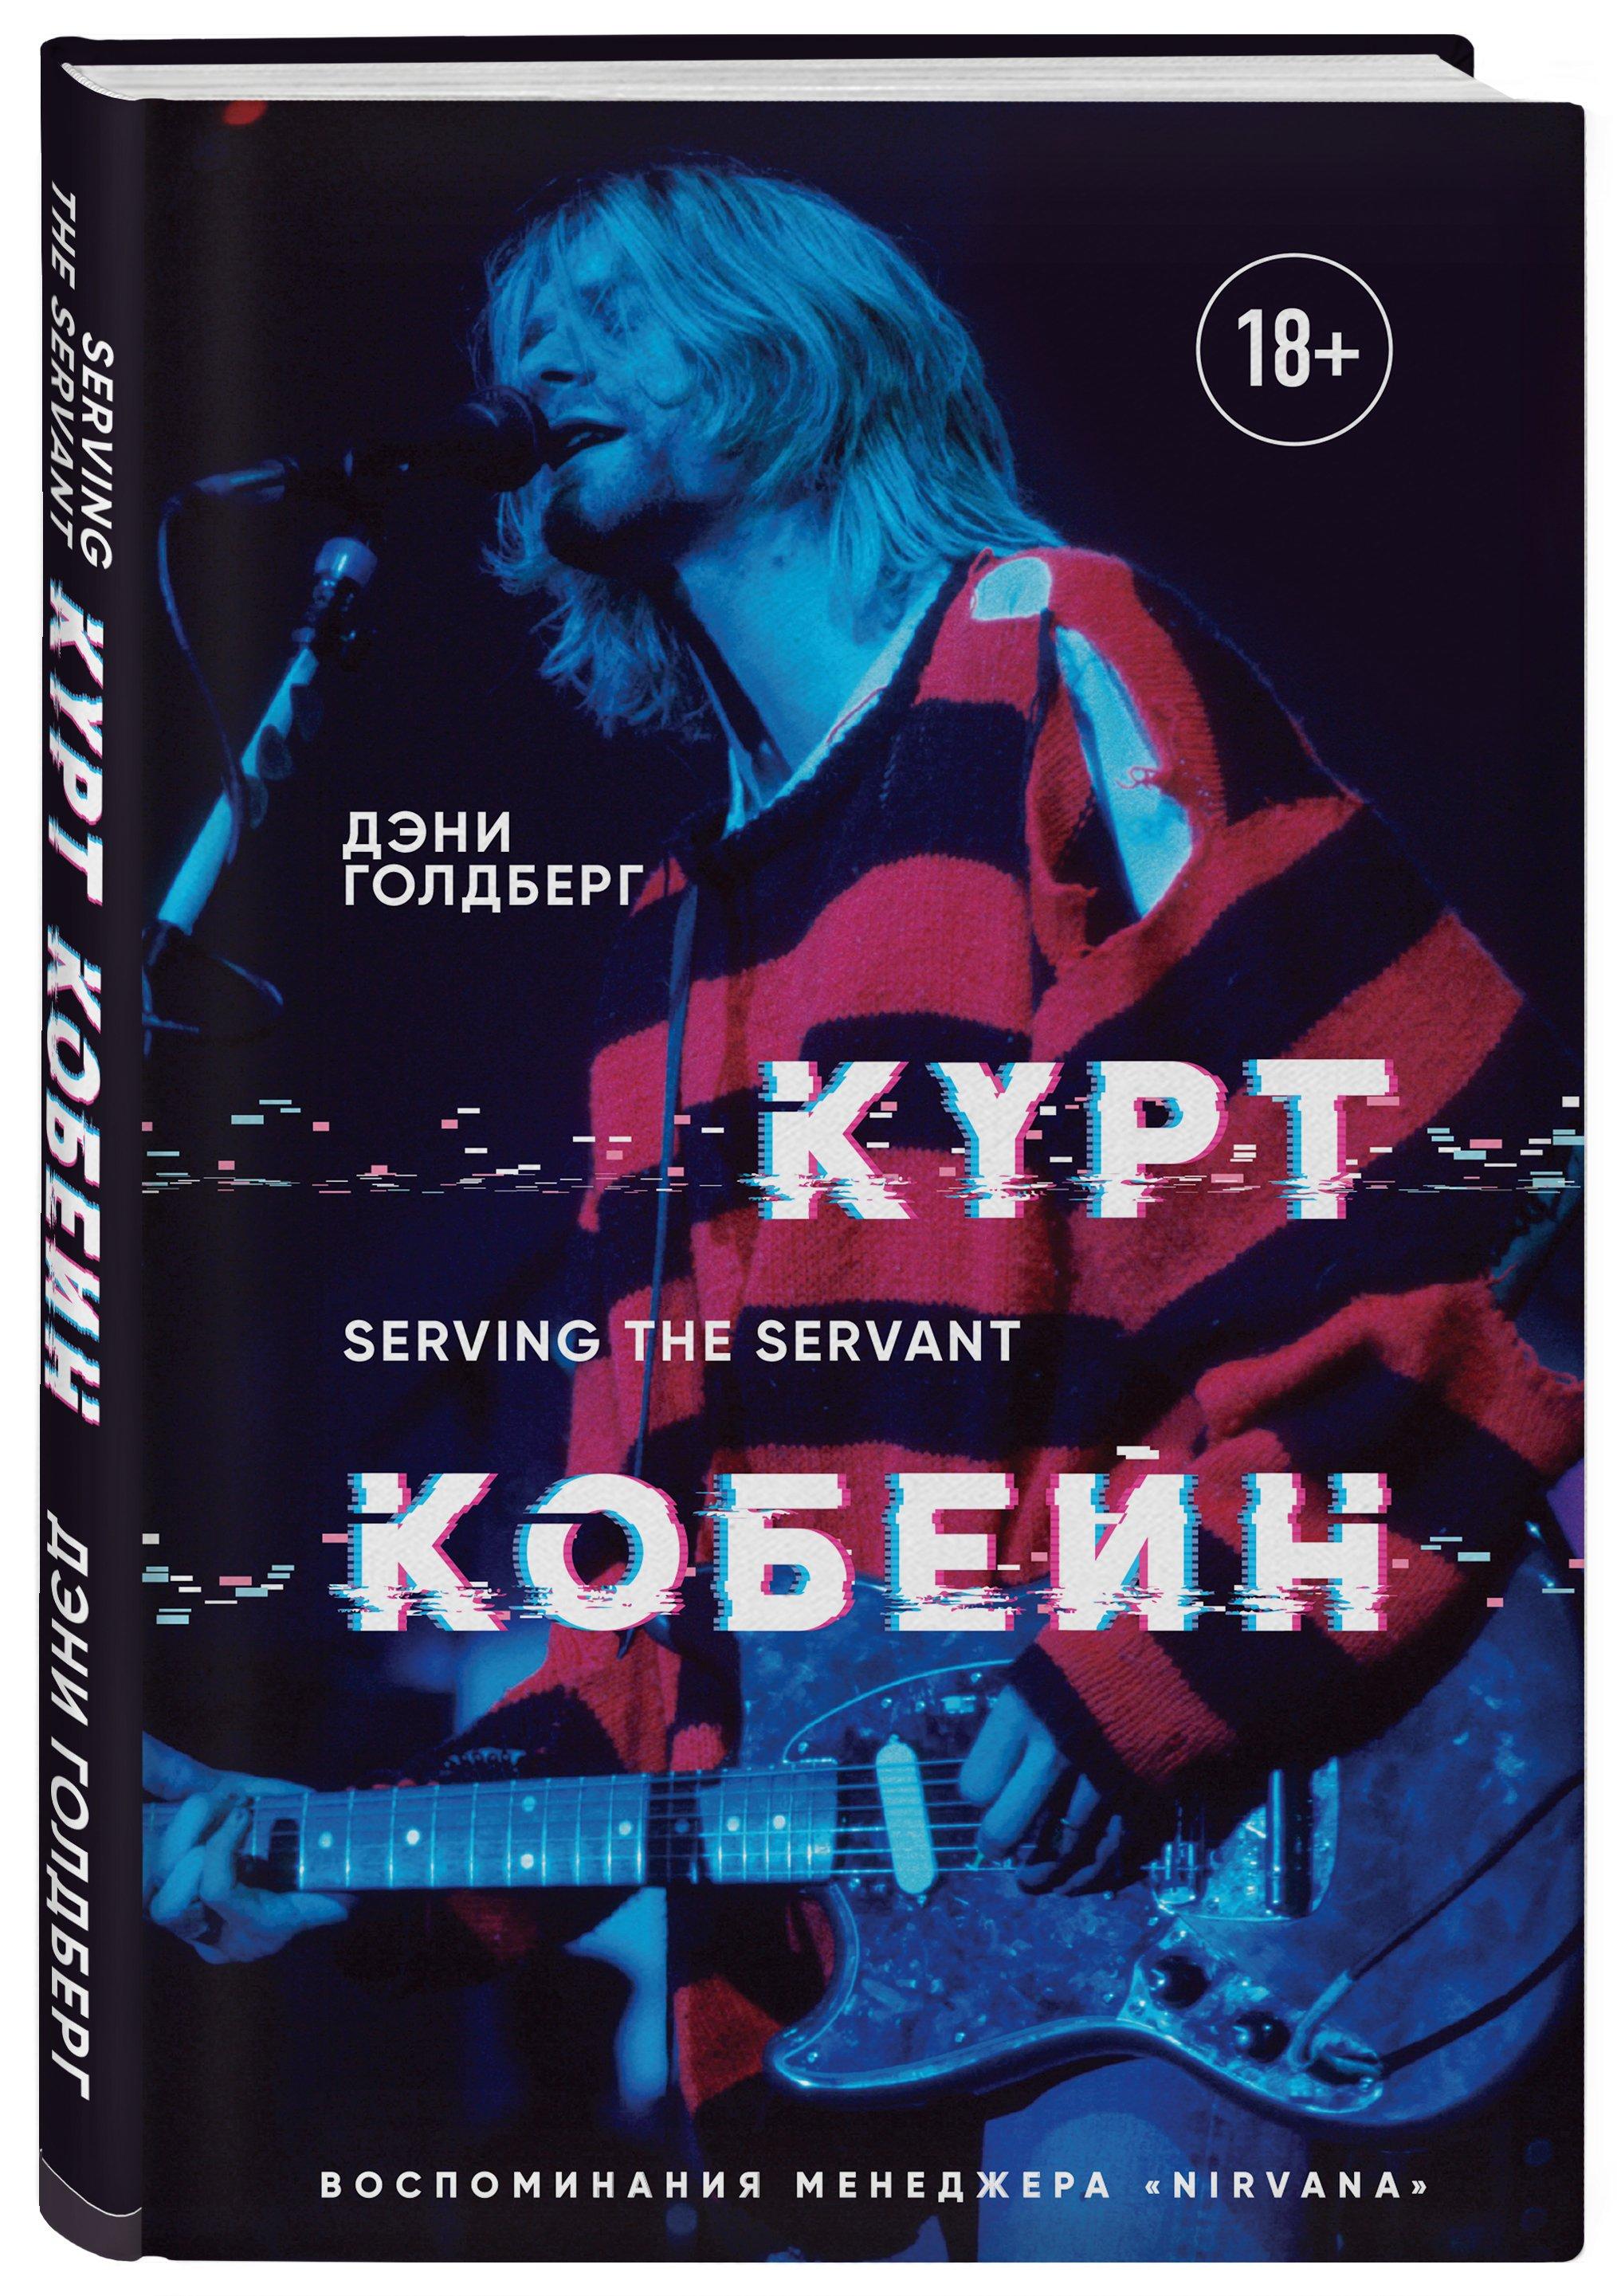 "Голдберг Дэни Курт Кобейн. Serving the Servant. Воспоминания менеджера ""Nirvana"""